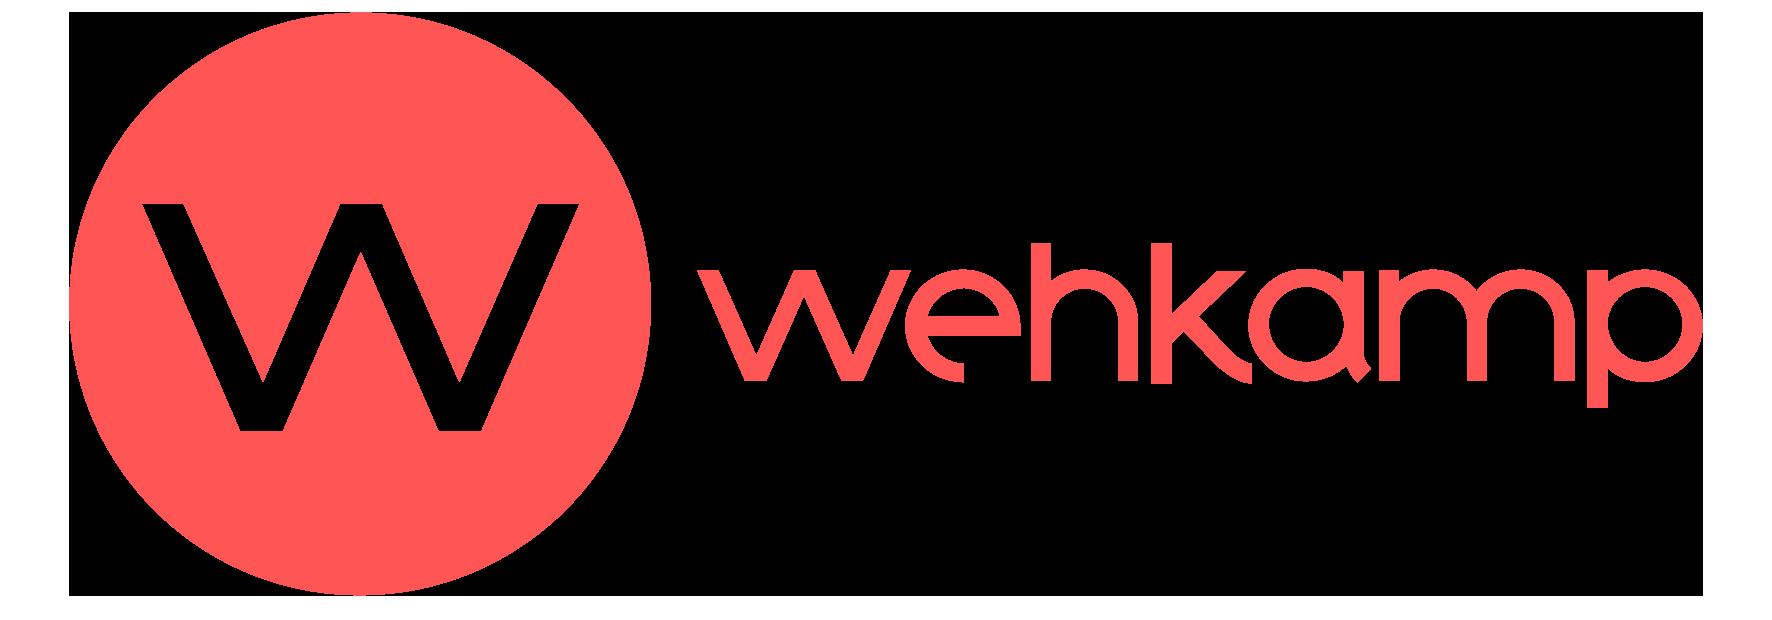 logo-wehkamp-site